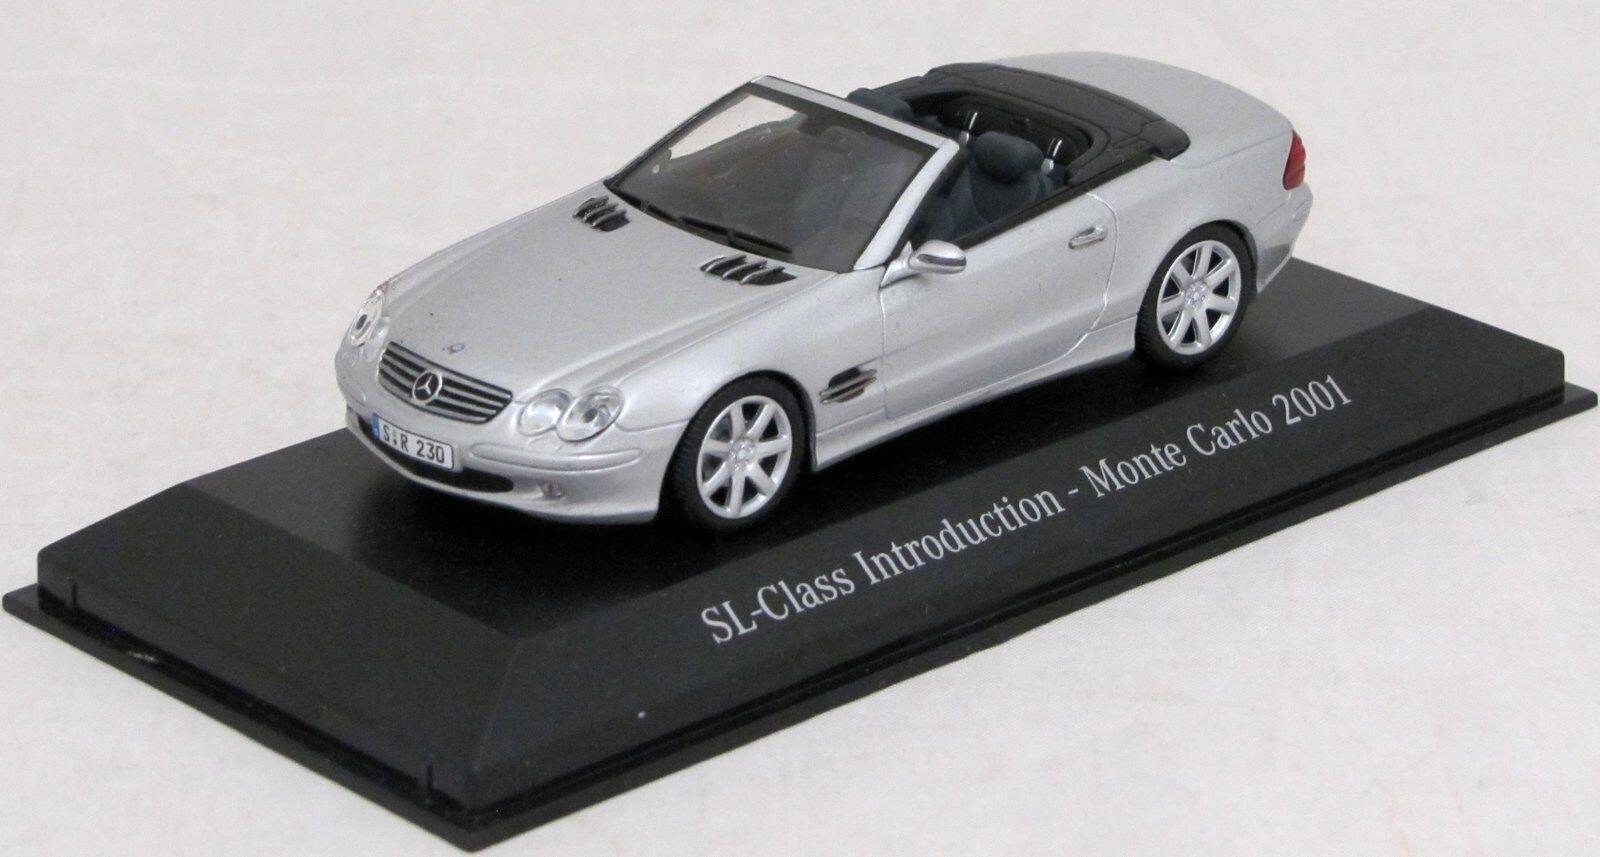 Mercedes Benz SL-Class Monte Carlo 2001 Diecast 1 43 Minichamps Paul's Model Art